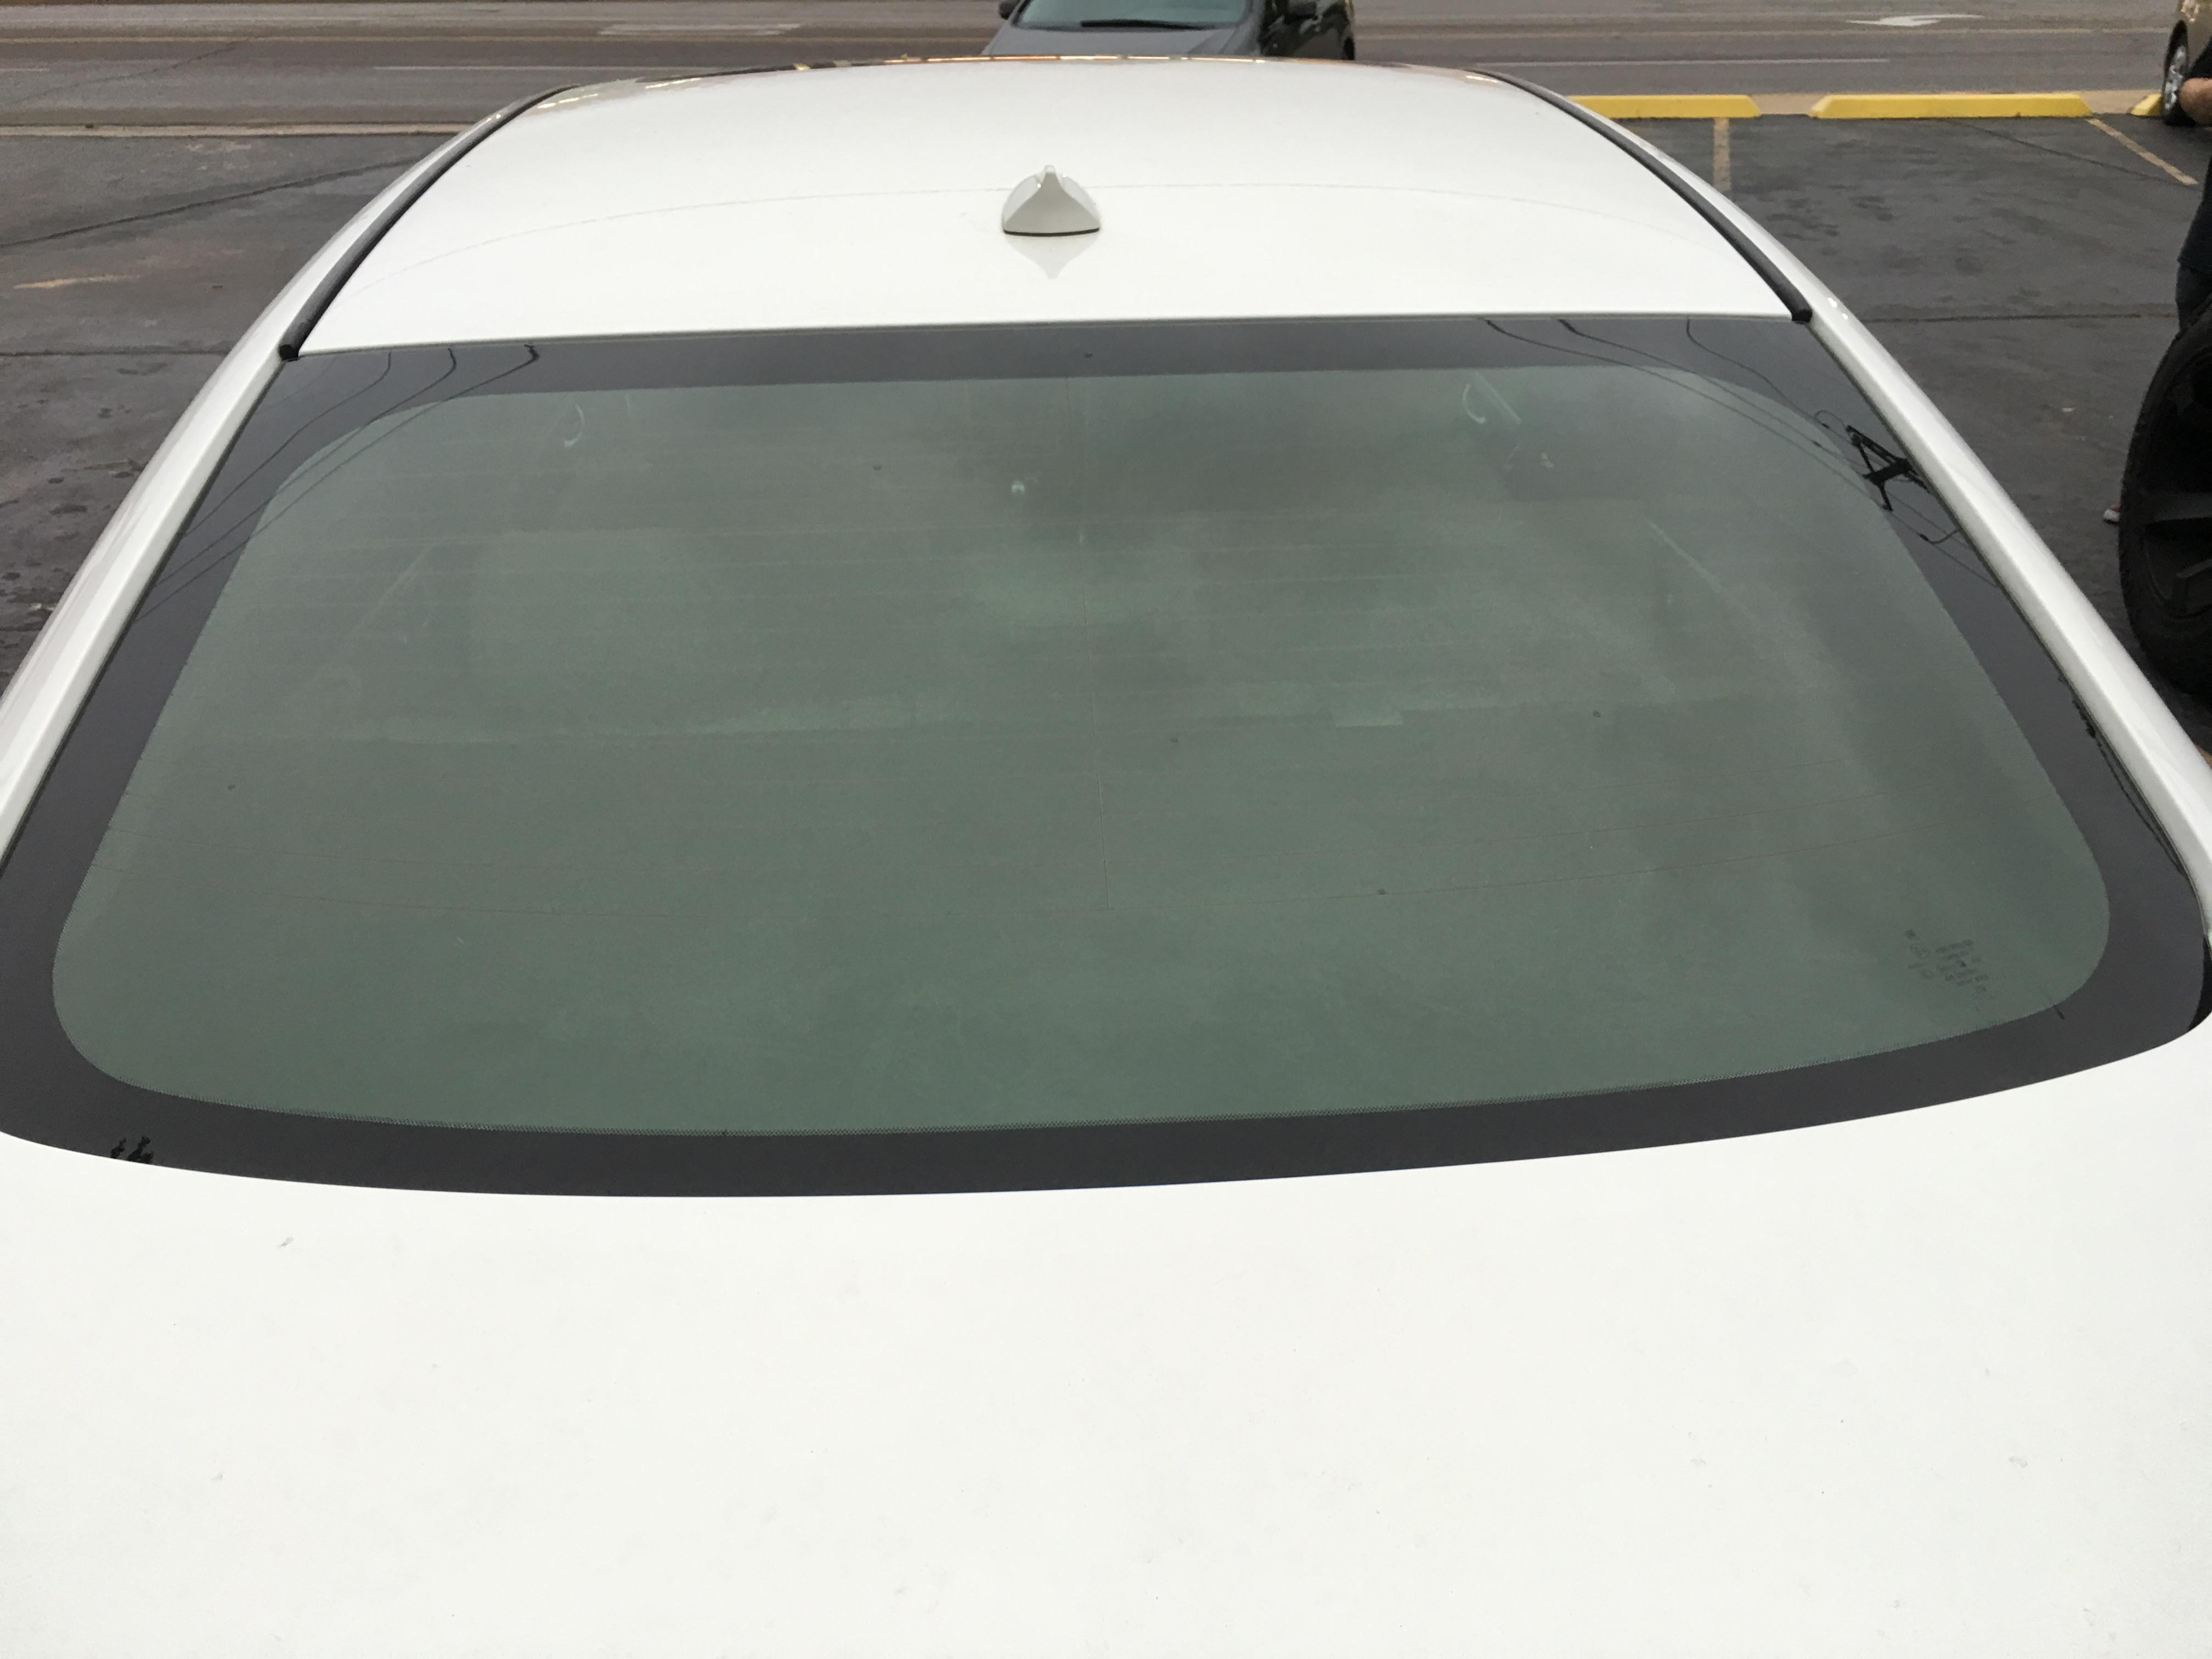 Car Tinting Oklahoma City Exclusive Provider of Autobahn Window